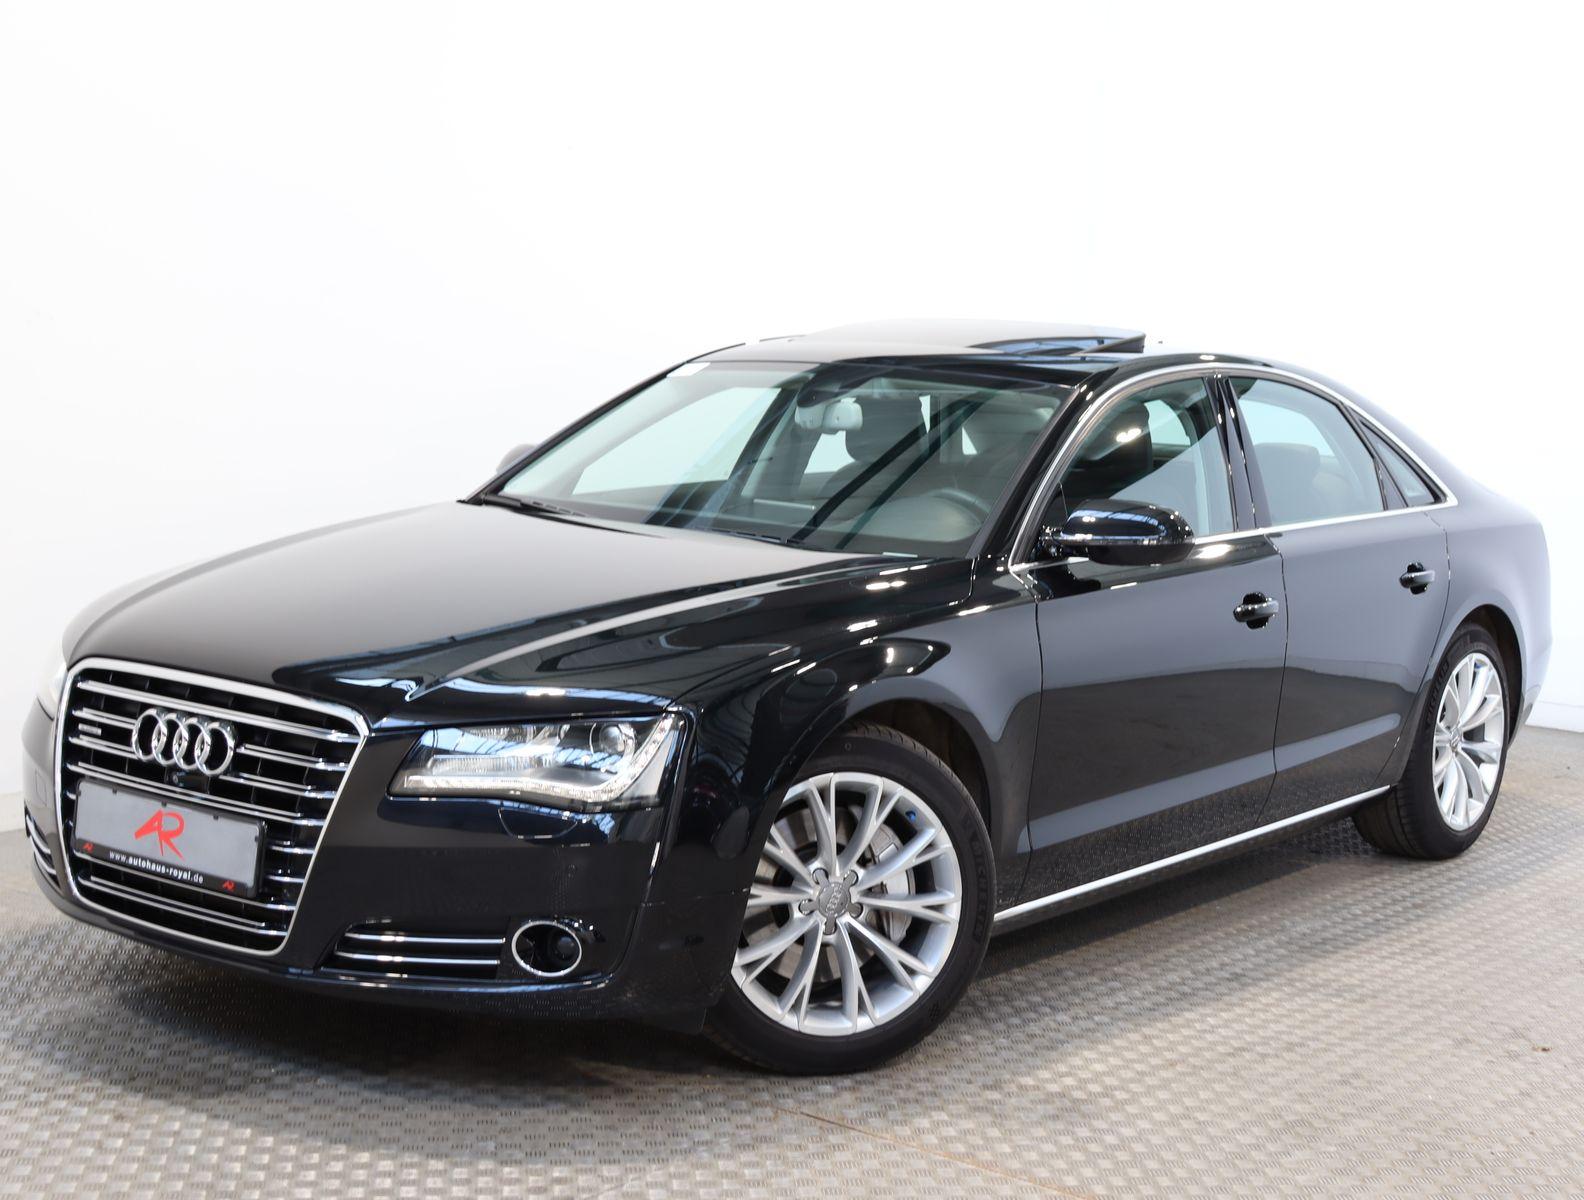 Audi A8 3.0 TDI qu ACC,360GRAD,KEYLESS,STANDHEIZUNG, Jahr 2013, Diesel